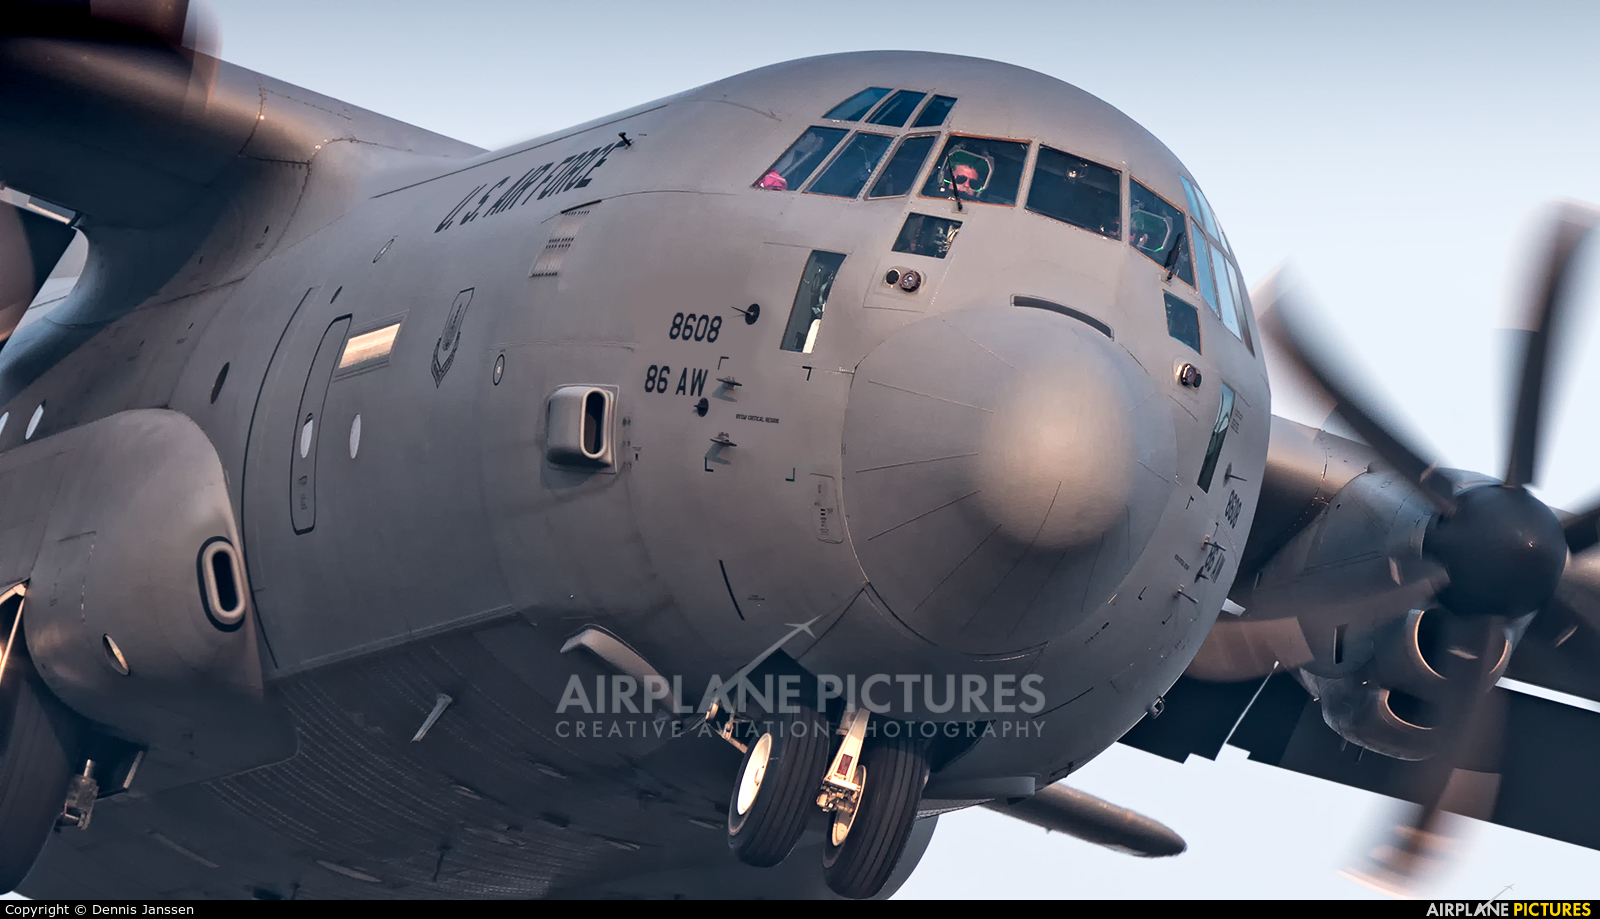 USA - Air Force 07-8608 aircraft at Amsterdam - Schiphol